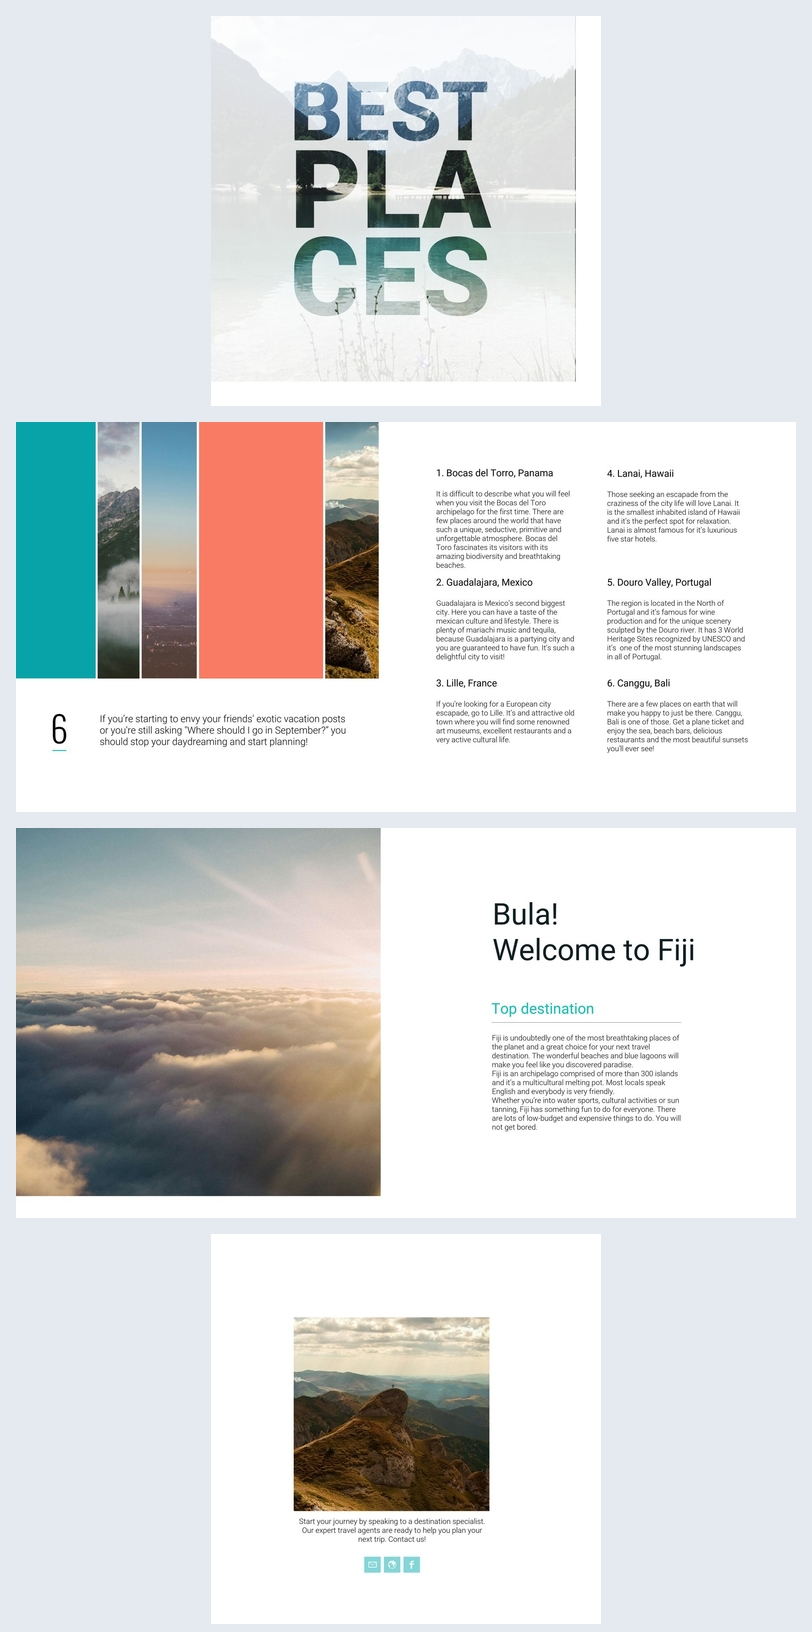 Beautiful Travel Guide Brochure Template - Flipsnack In Travel Guide Brochure Template